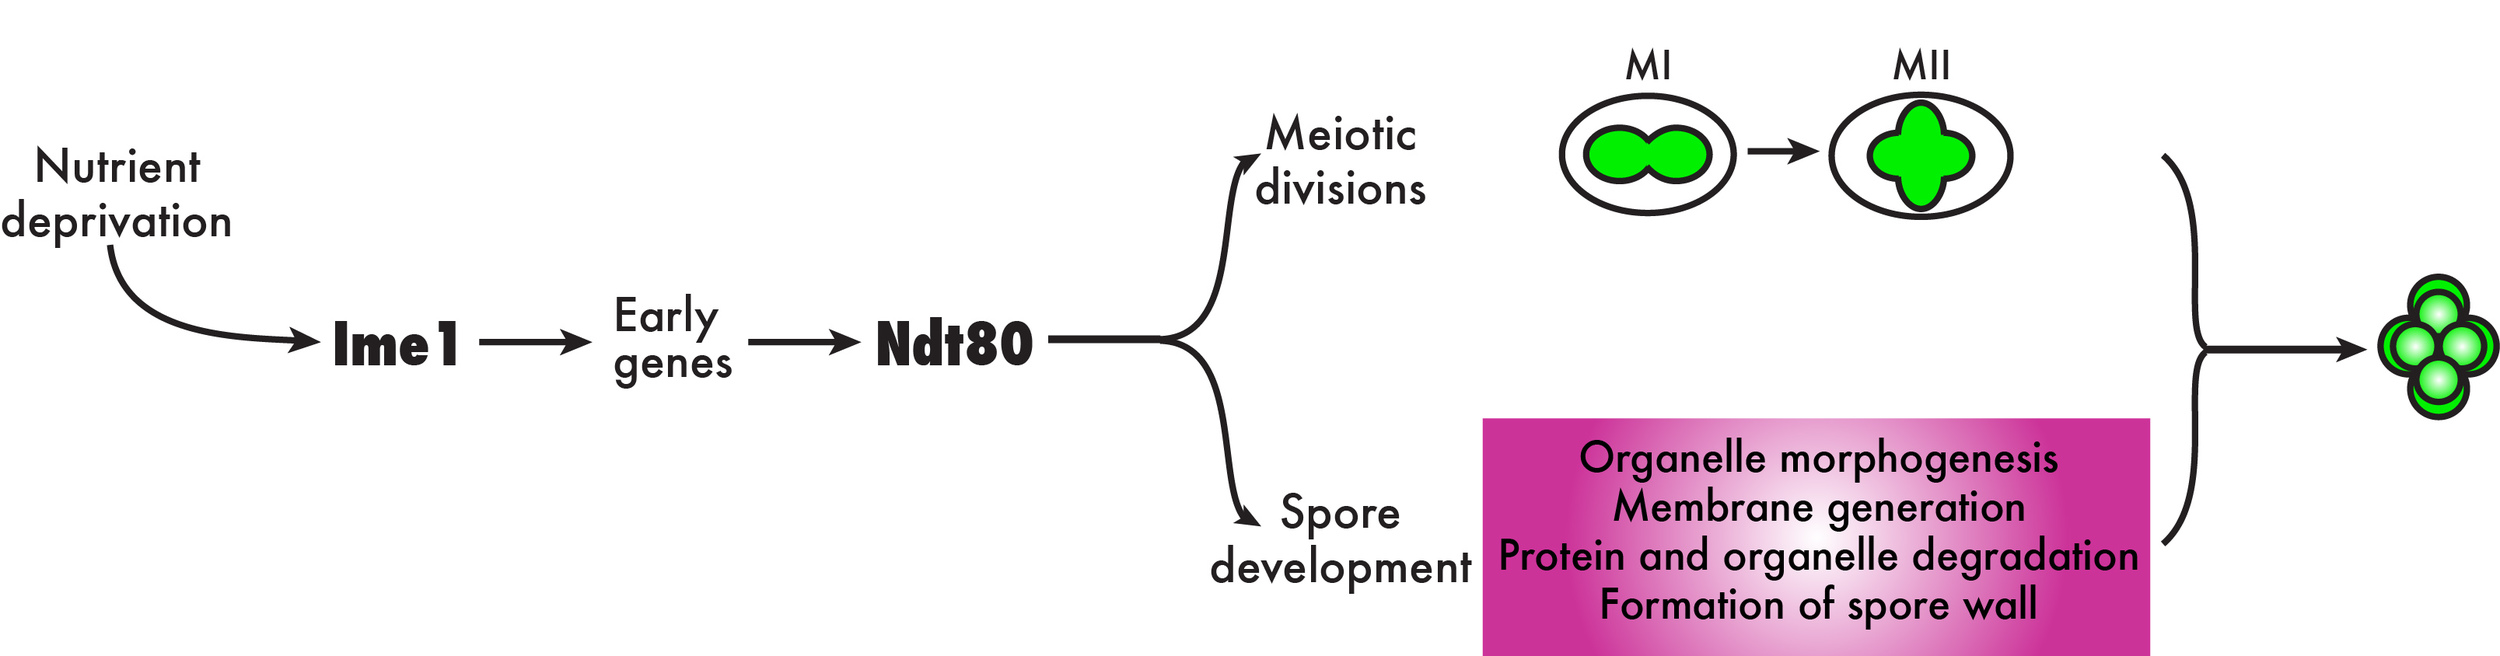 Transcriptional regulation of gametogenesis in budding yeast